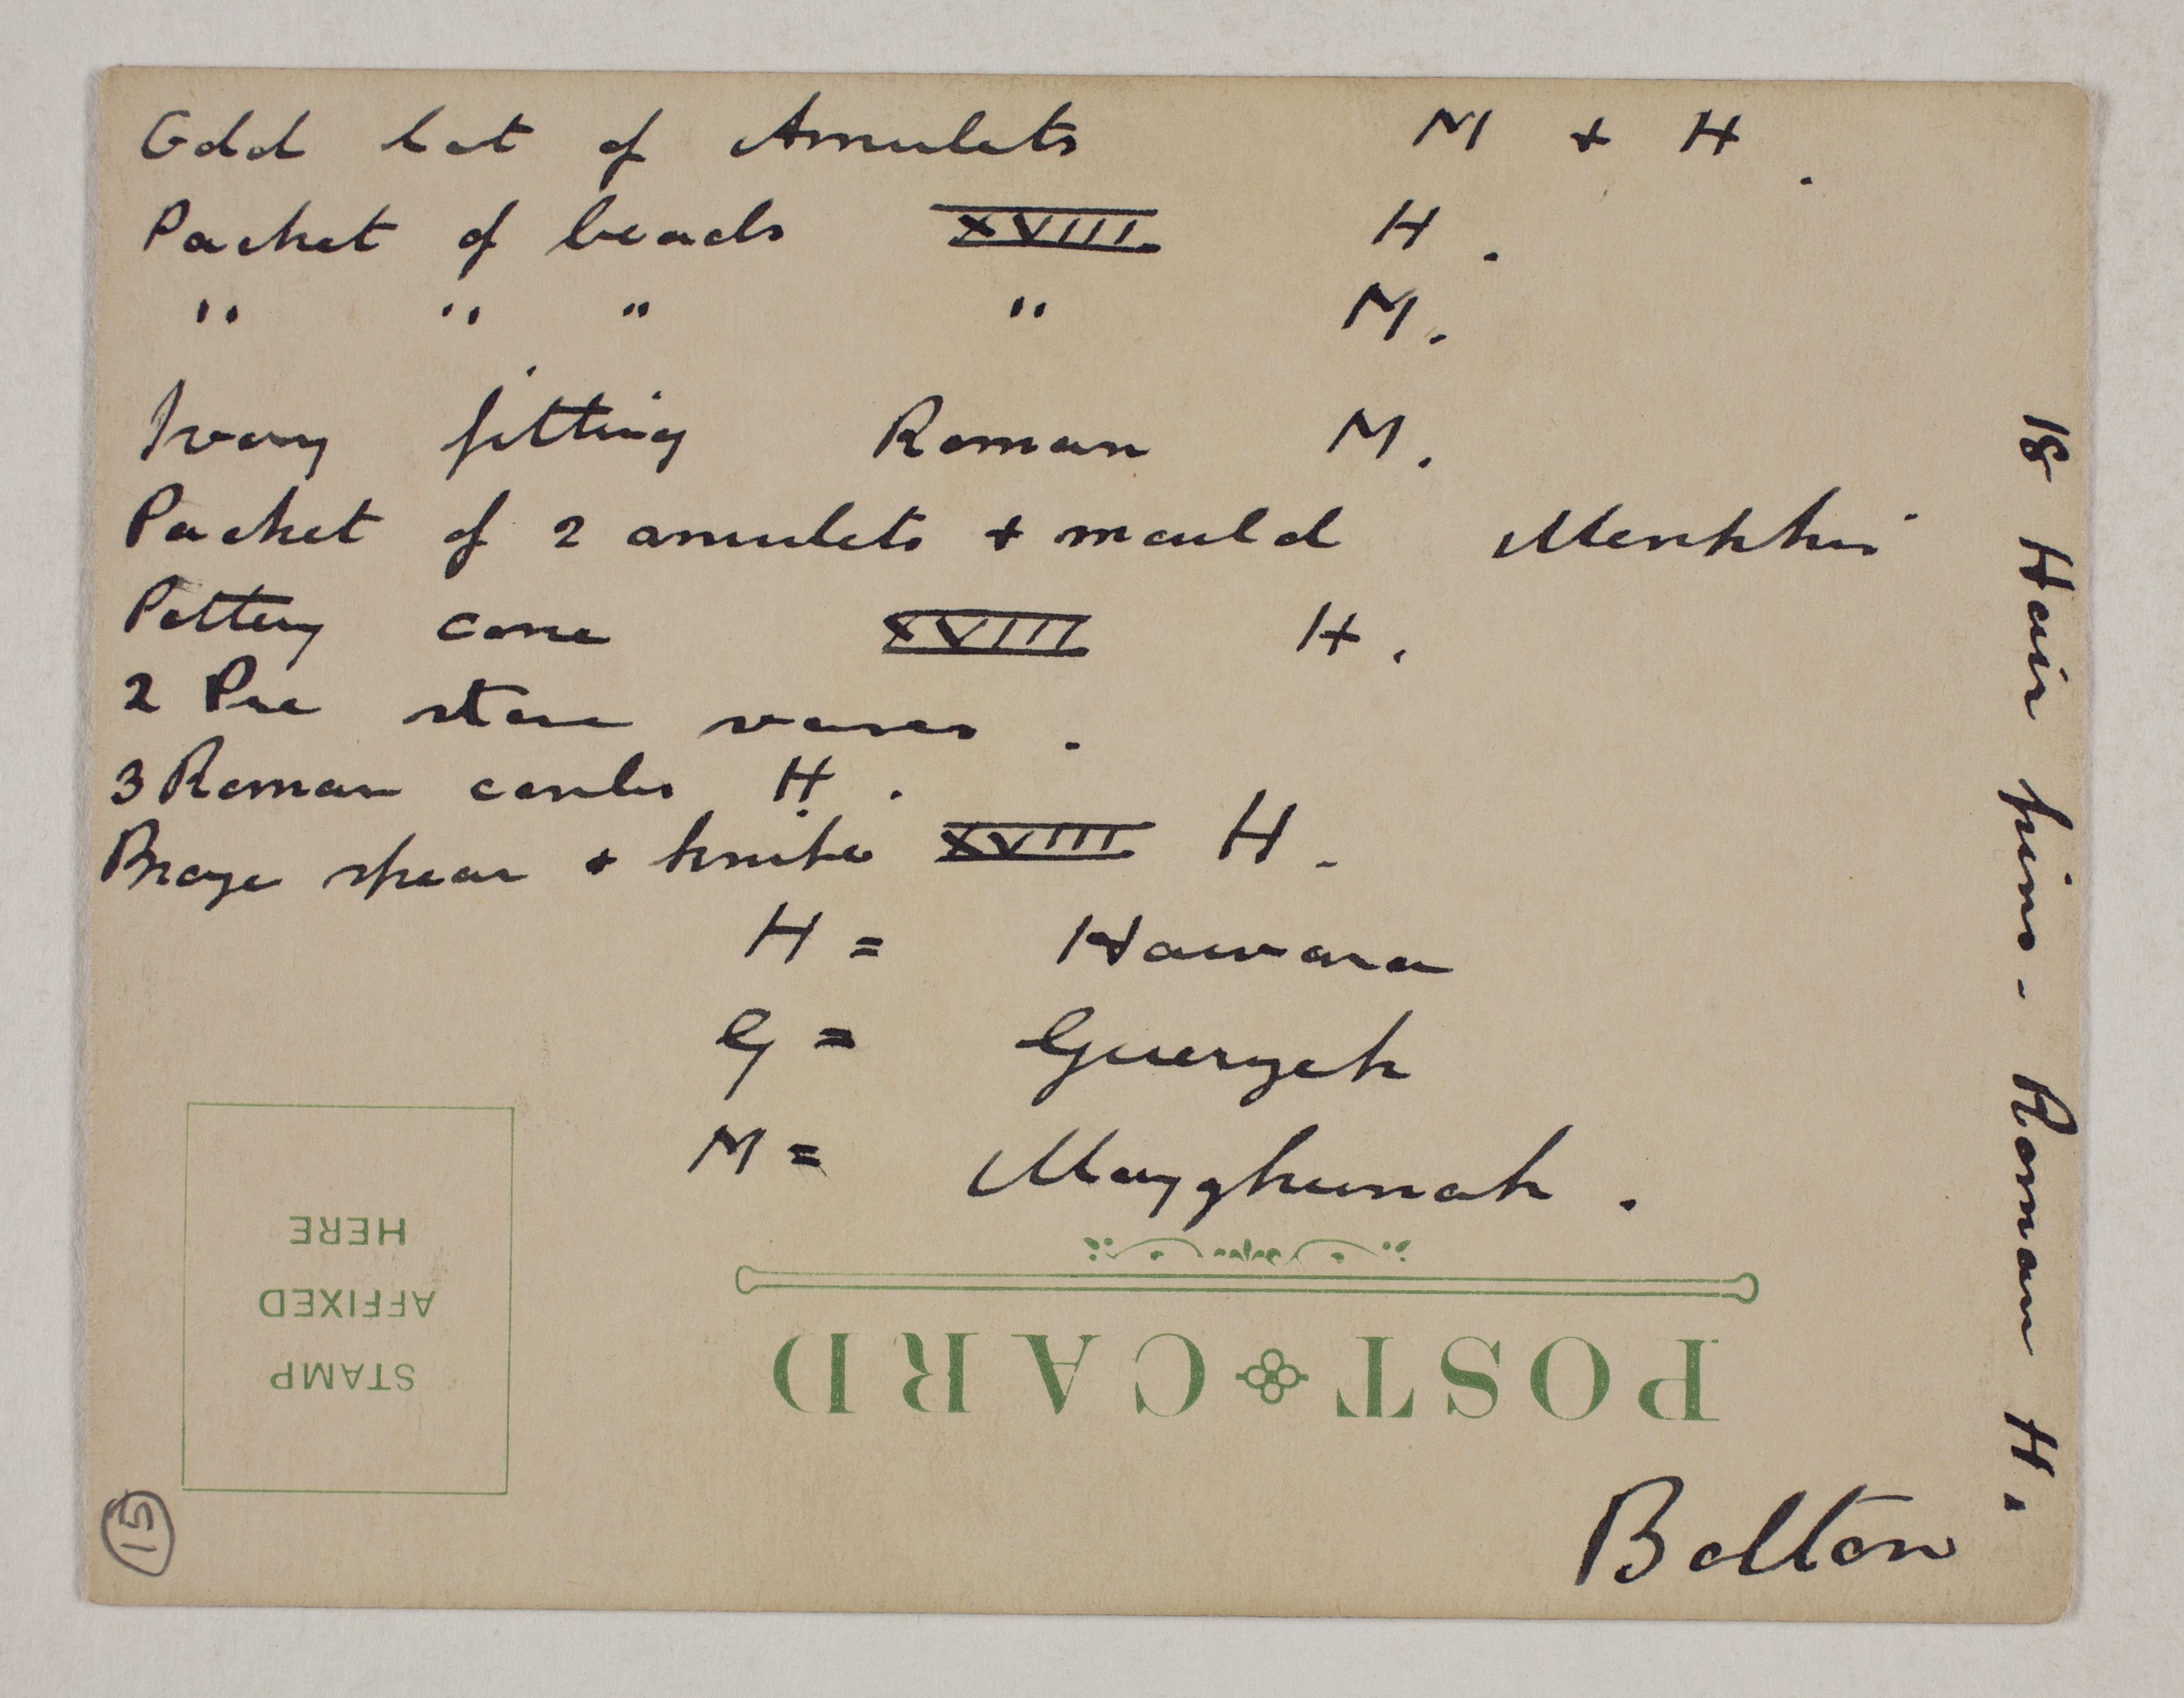 1910-11 Hawara, Gerzeh, Memphis, Mazghuneh Individual institution list  PMA/WFP1/D/19/15.2